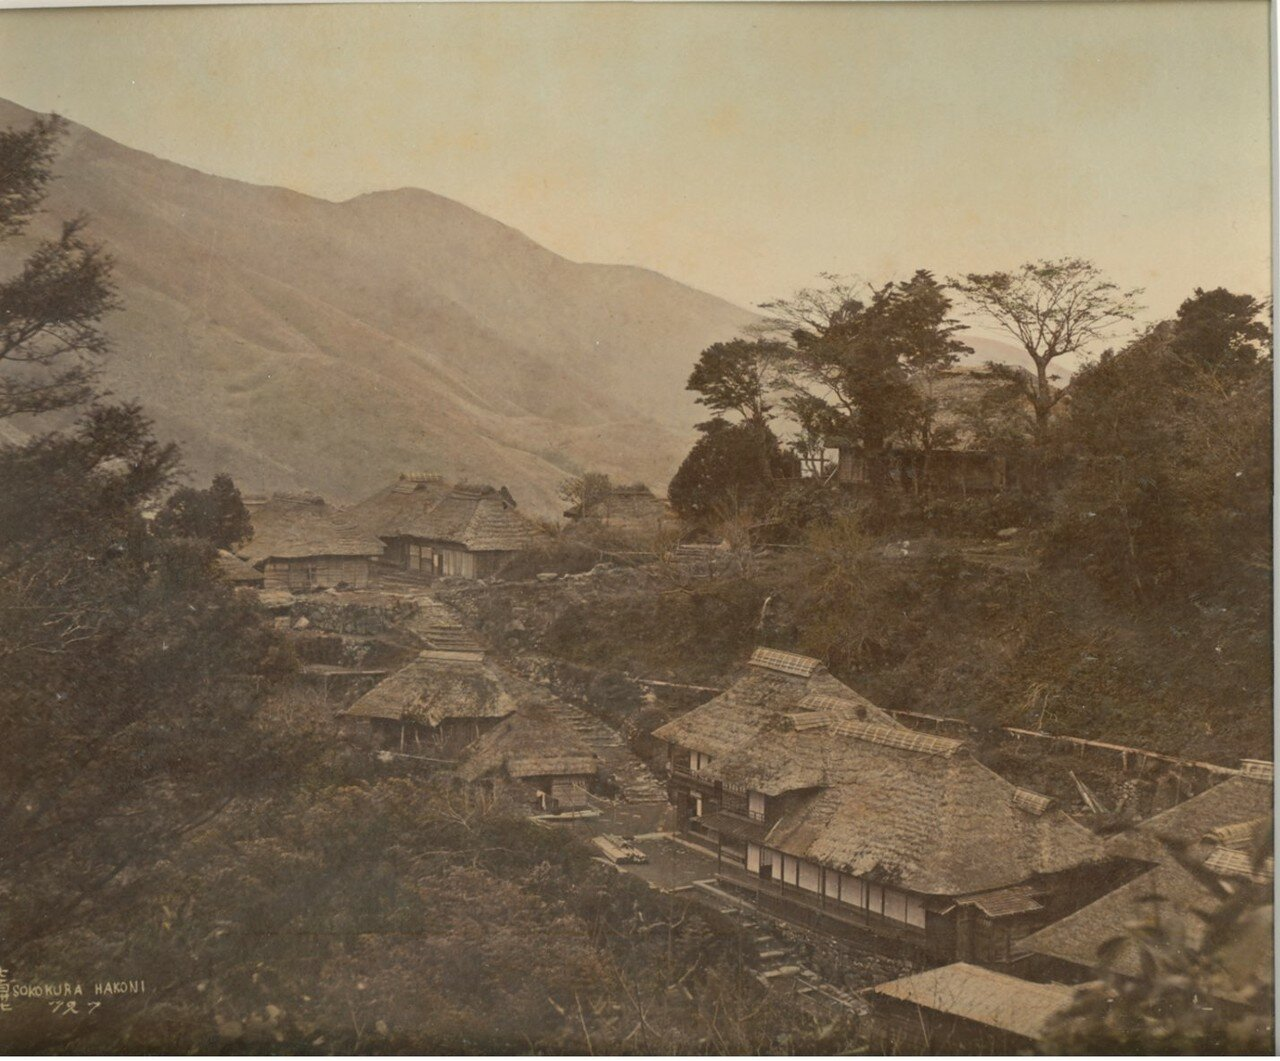 Сококура, Хаконе. 1885